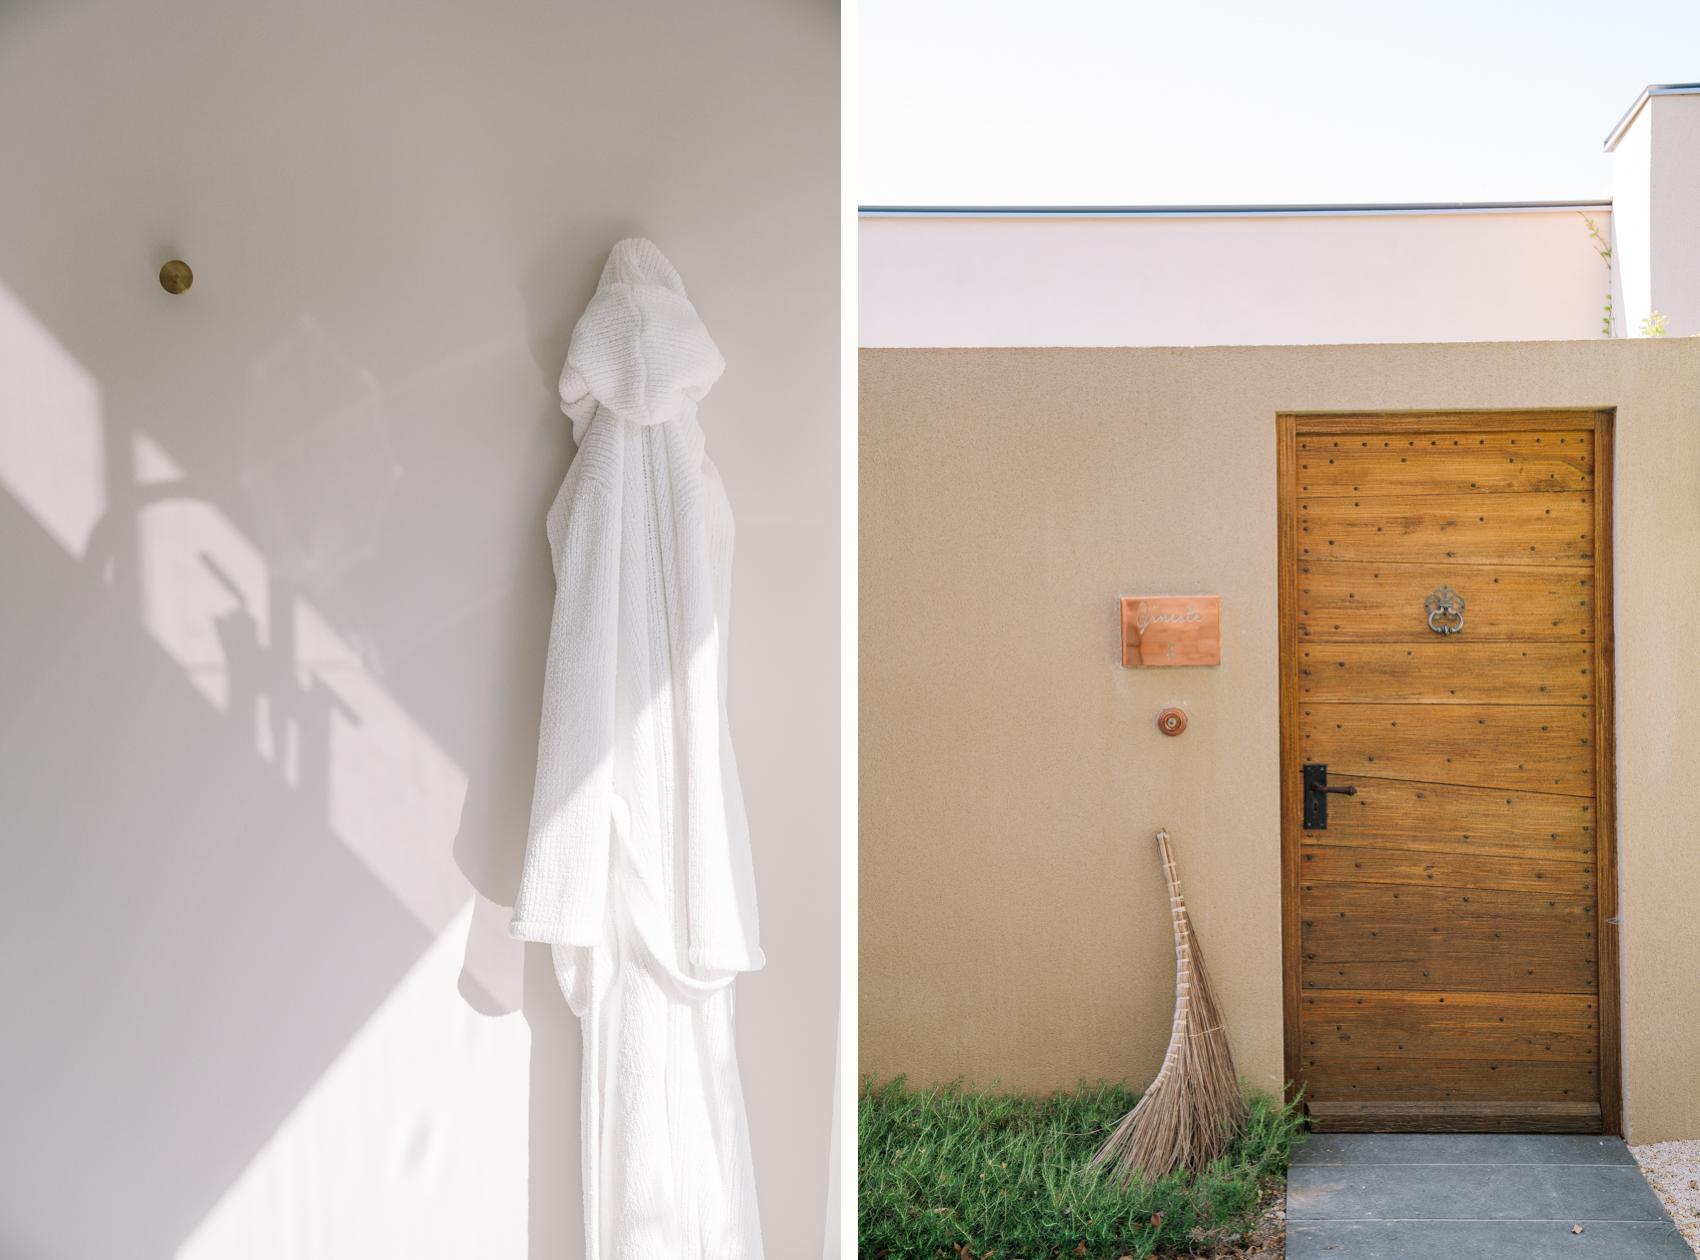 TRAVEL-Photography-provence-hotel-resort-interior-Villa-La-Coste-Clara-Tuma_001A.jpg